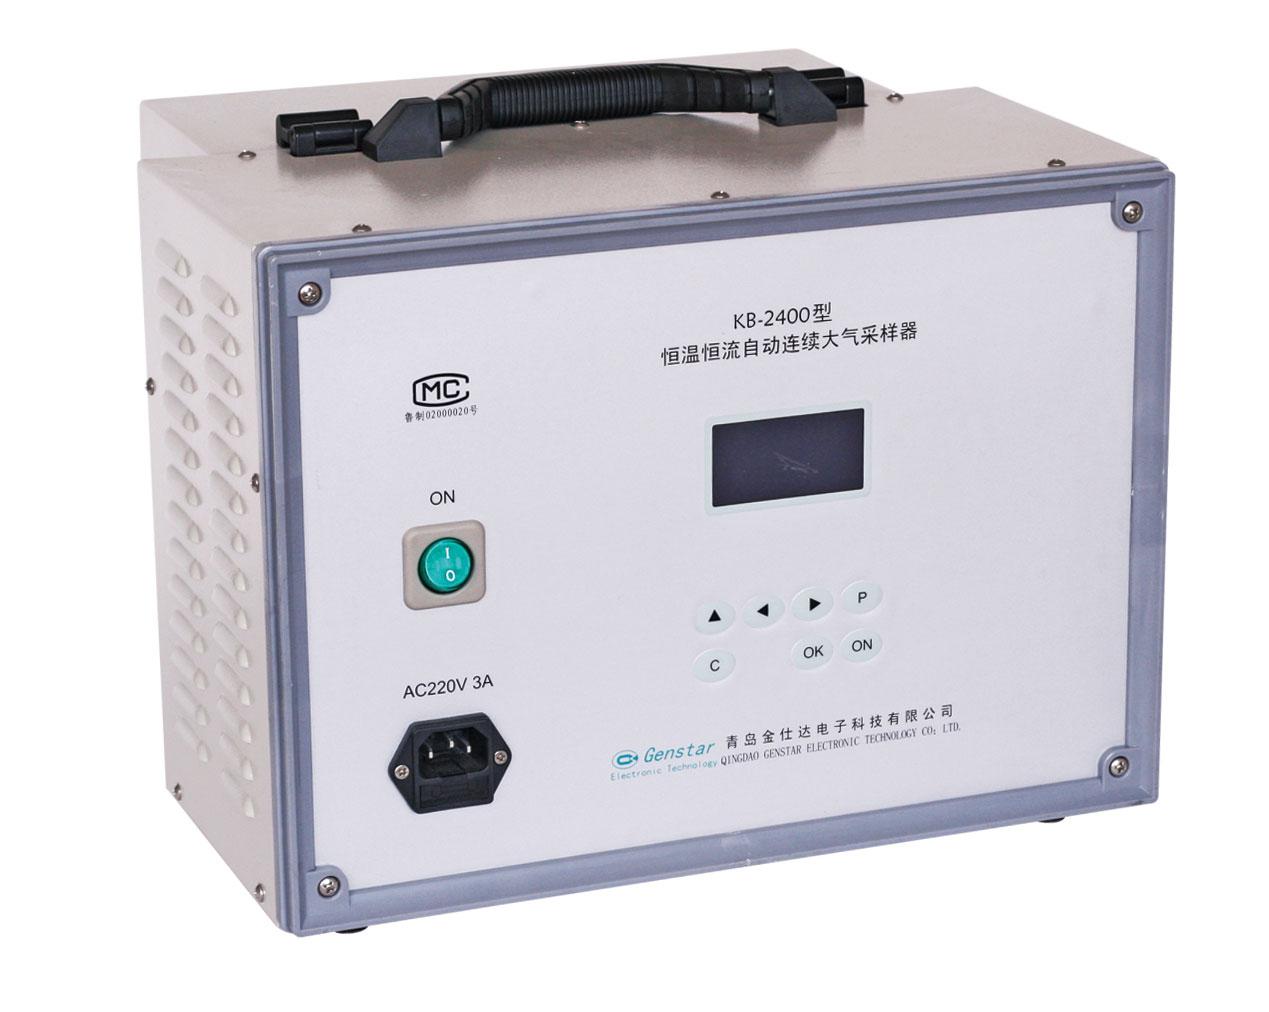 KB-2400(C)型恒温恒流自动连续大气采样器